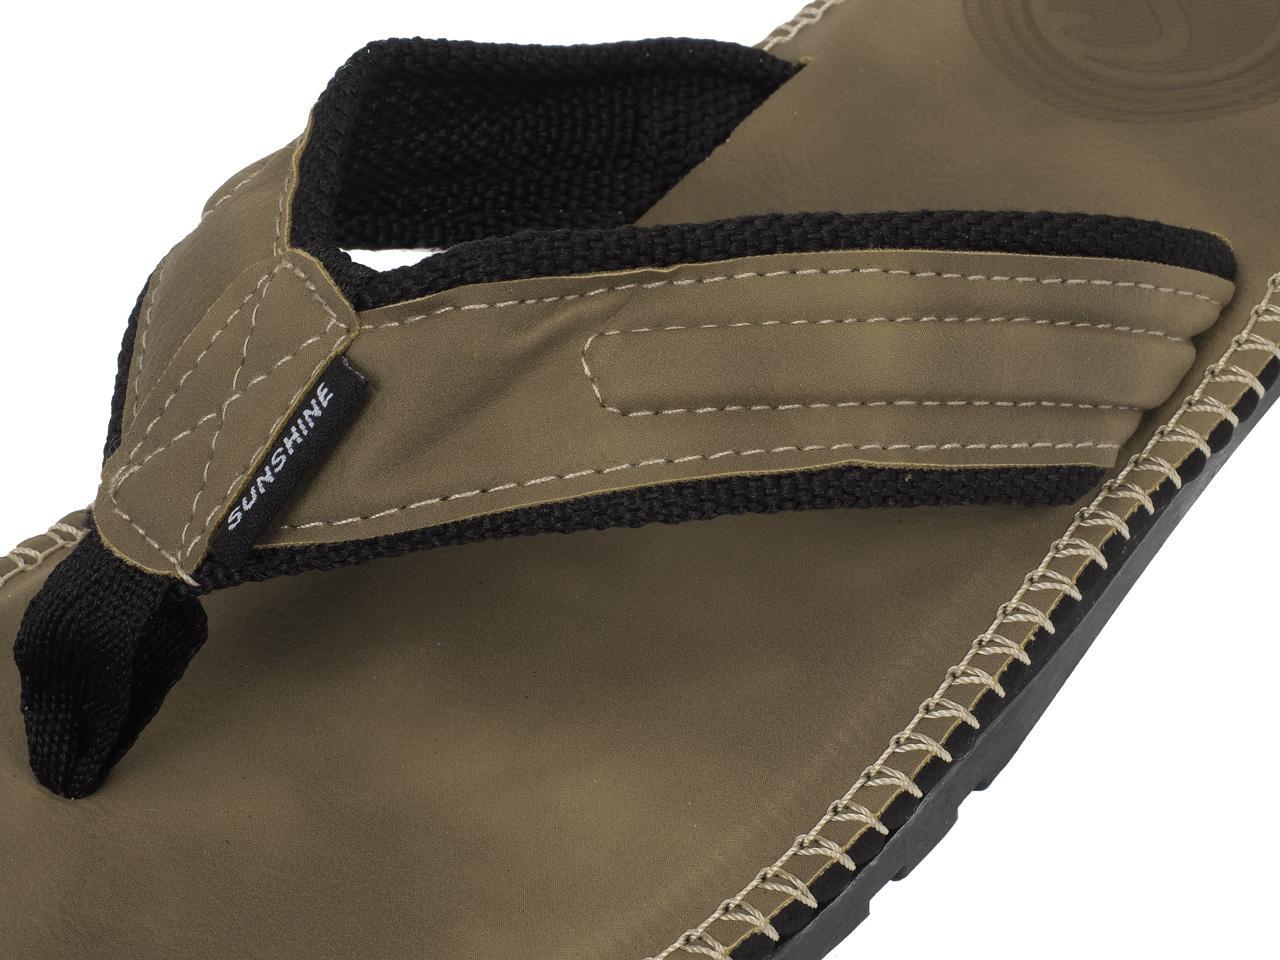 Flip-Flops-Tap-Dance-Shoes-Treeker9-Barbados-Beige-Flip-Flop-H-Beige-77481-New thumbnail 2